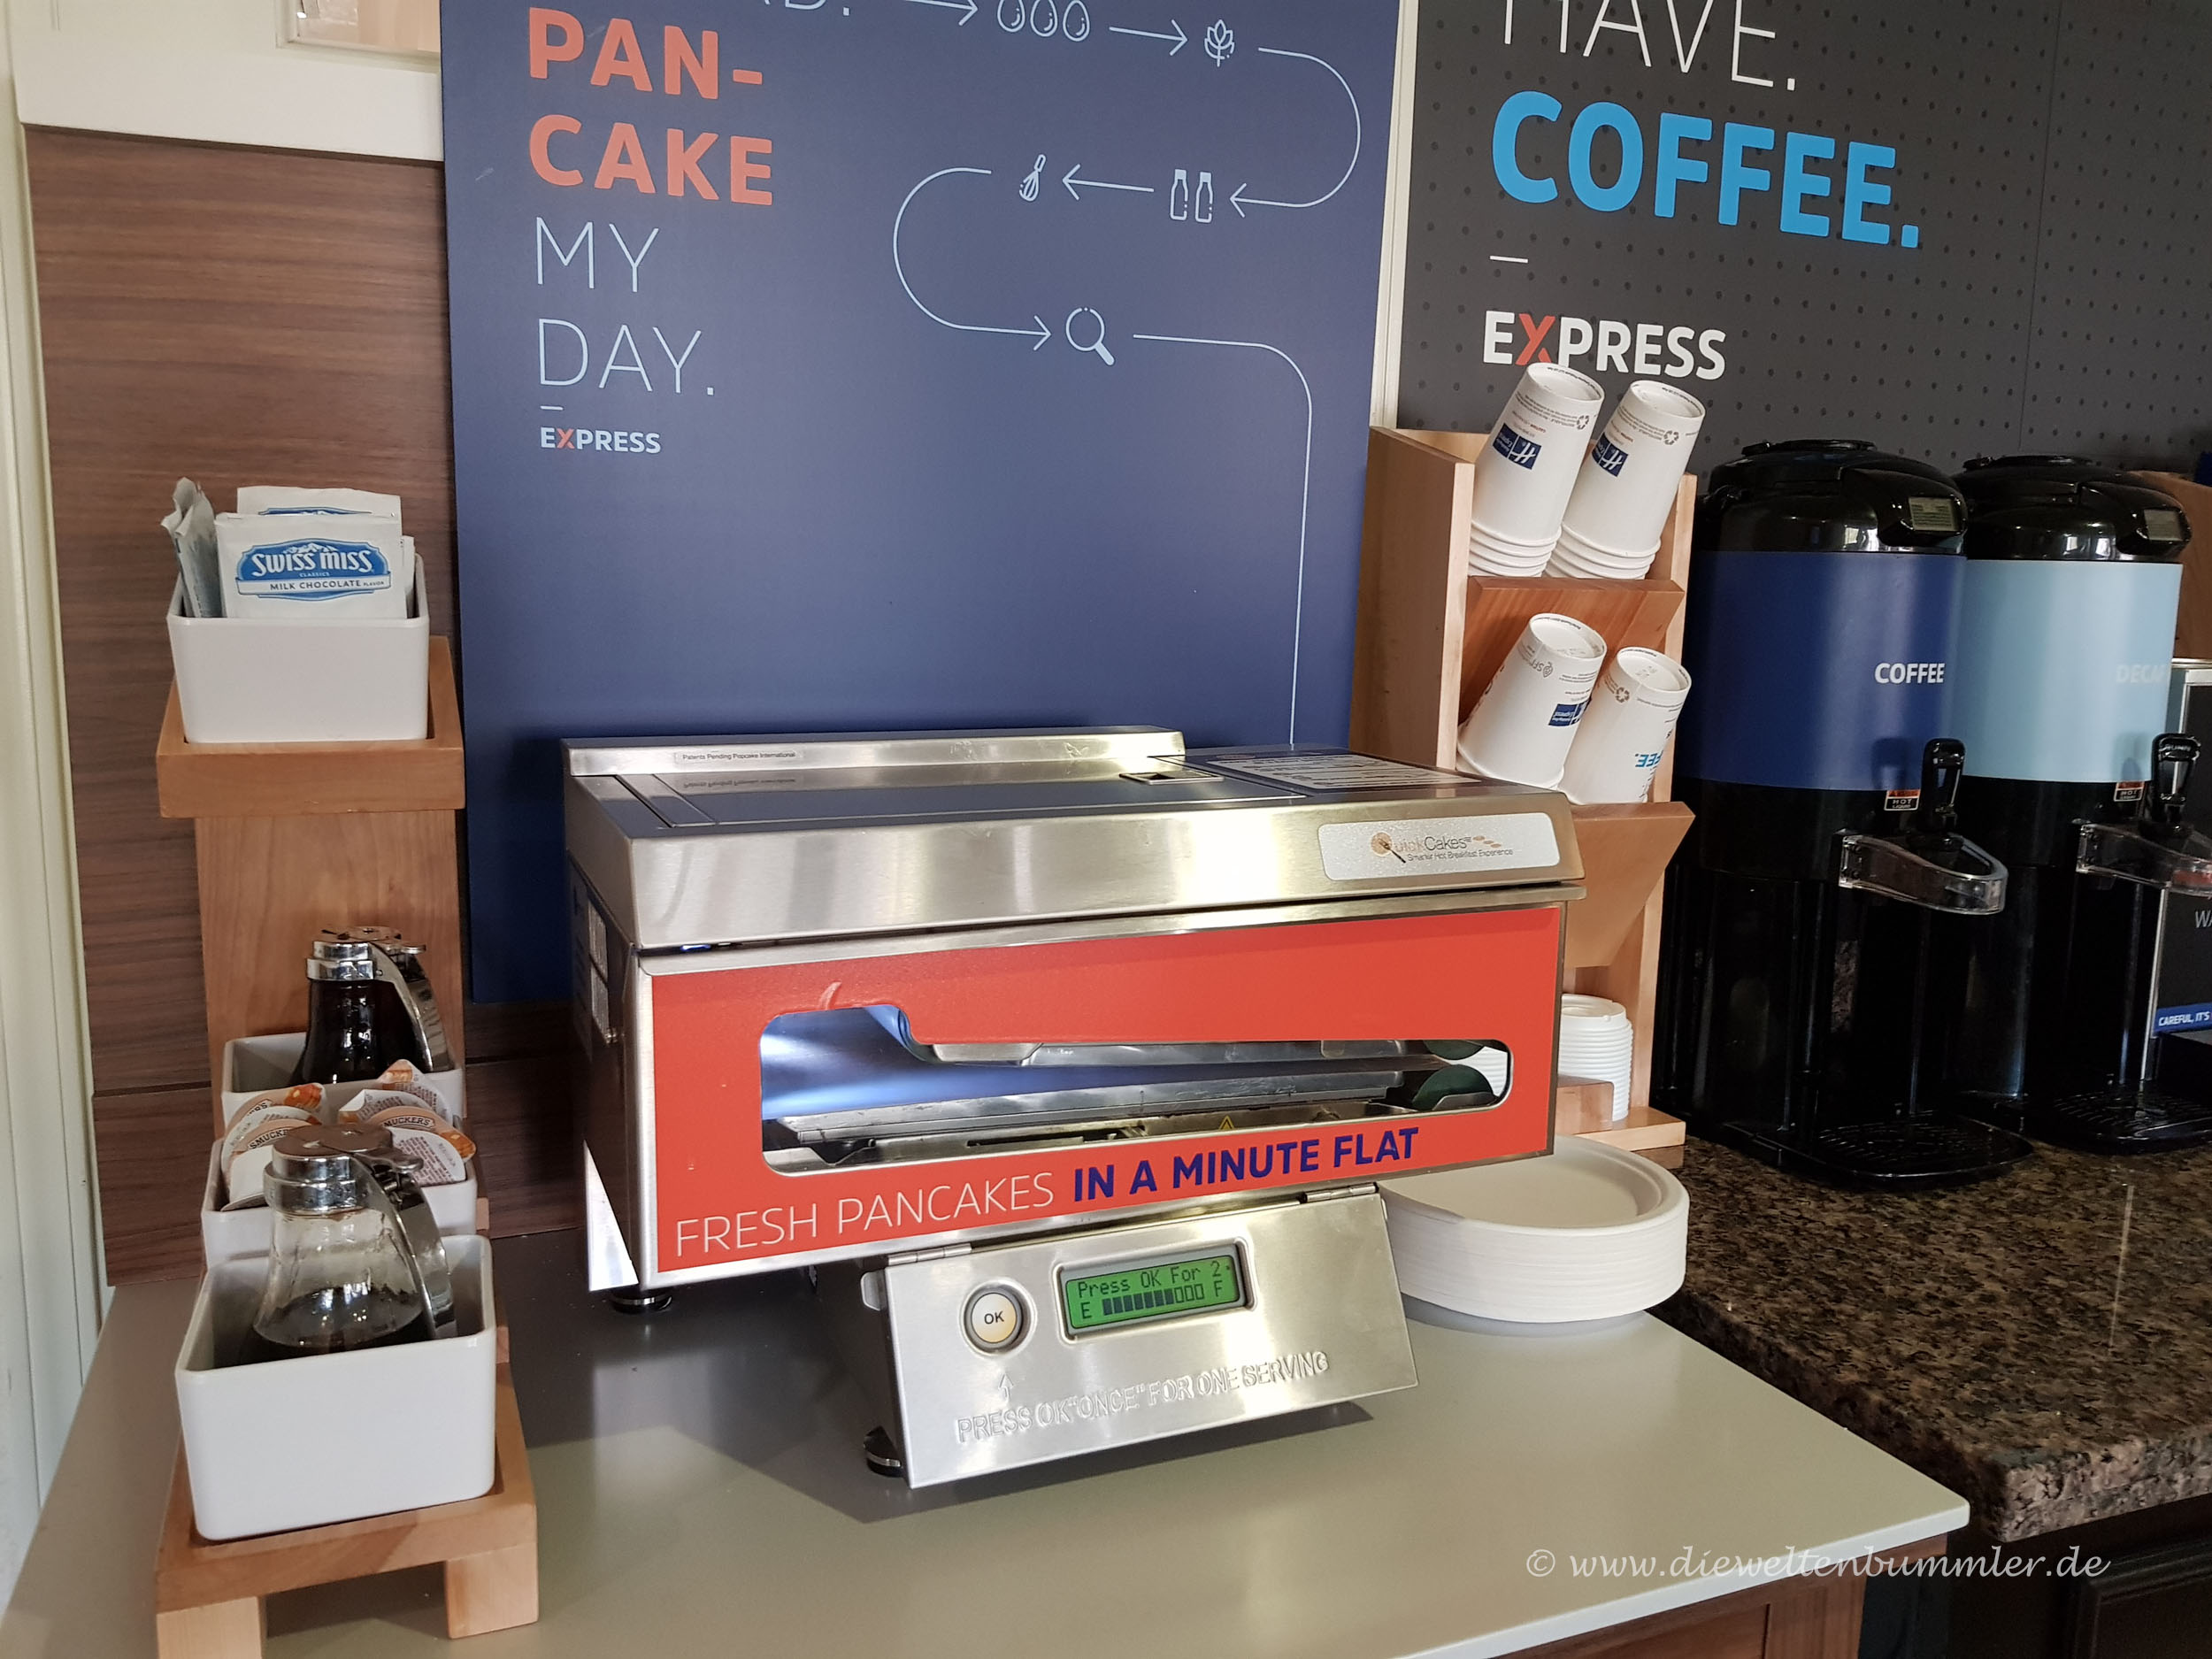 Pancake-Automat im klassischen Frühstücksraum